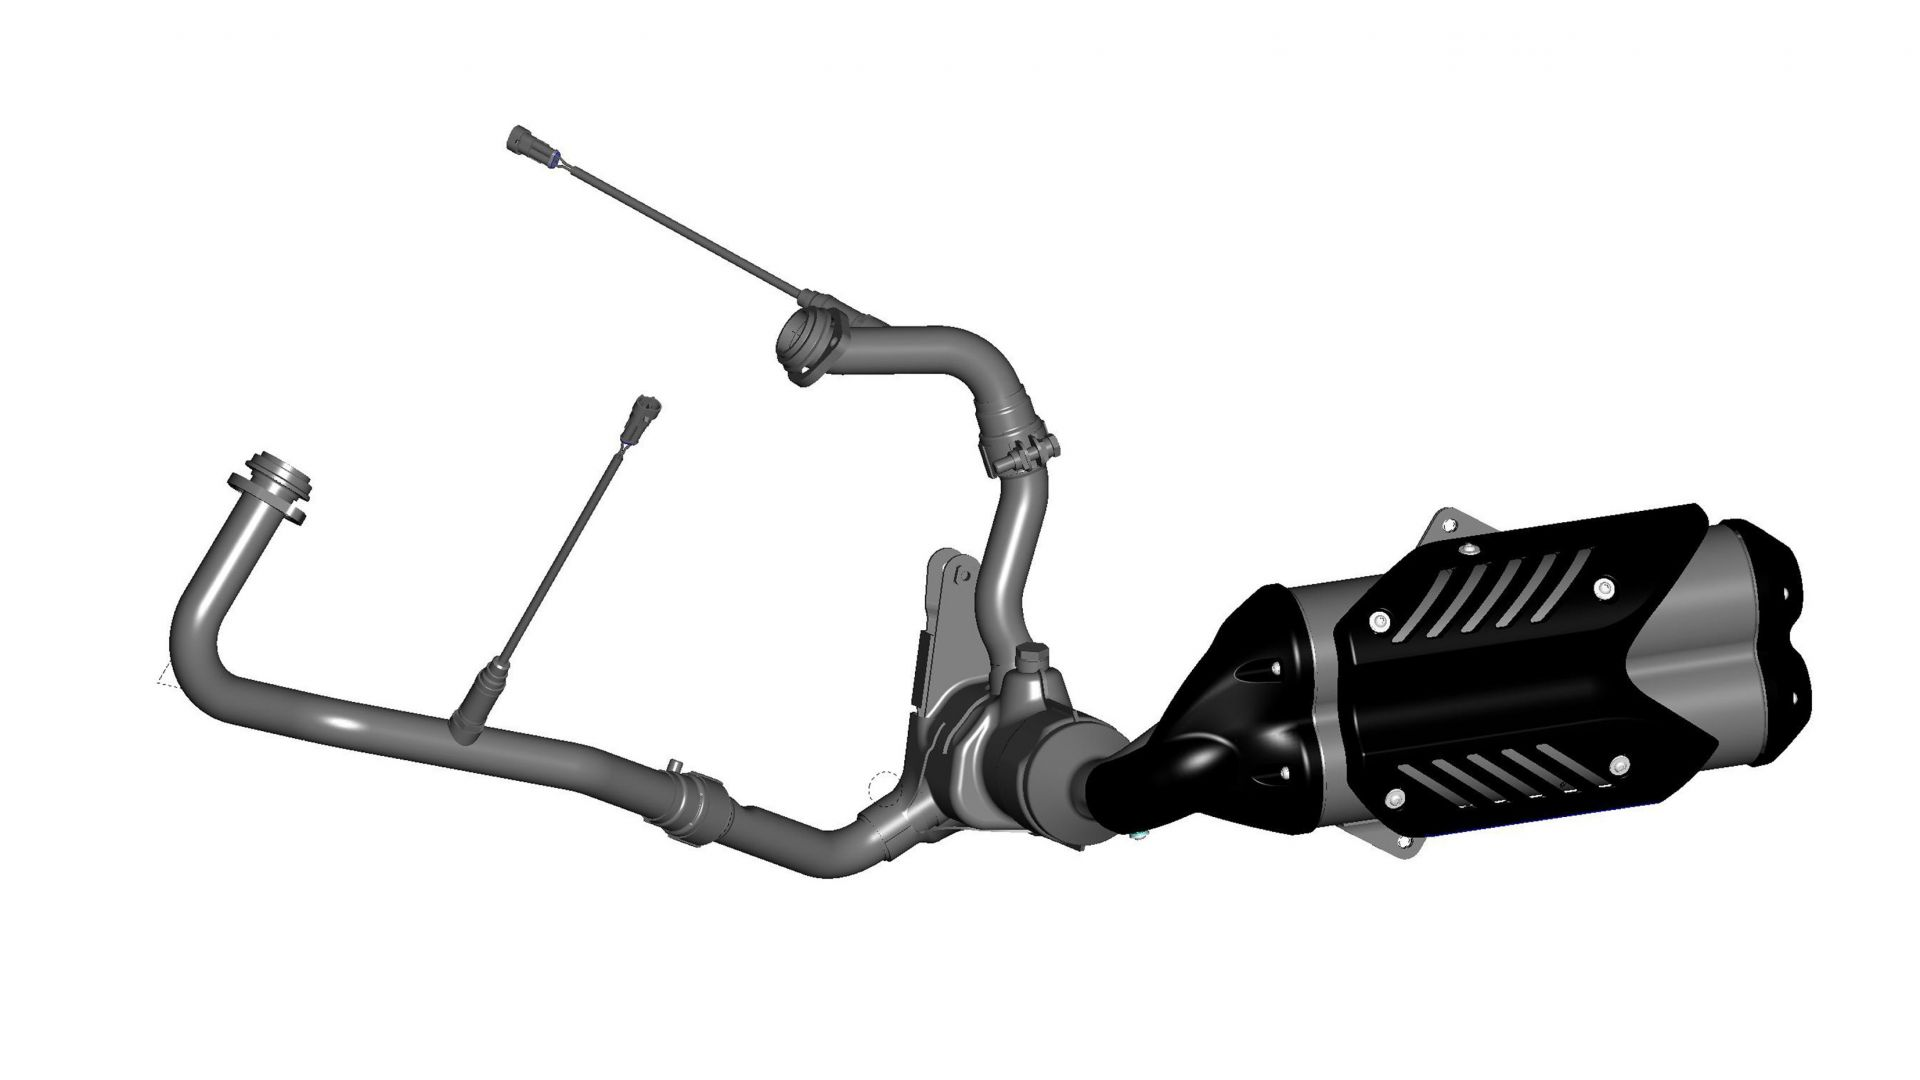 Immagine 53: Aprilia SRV 850 ABS/ATC